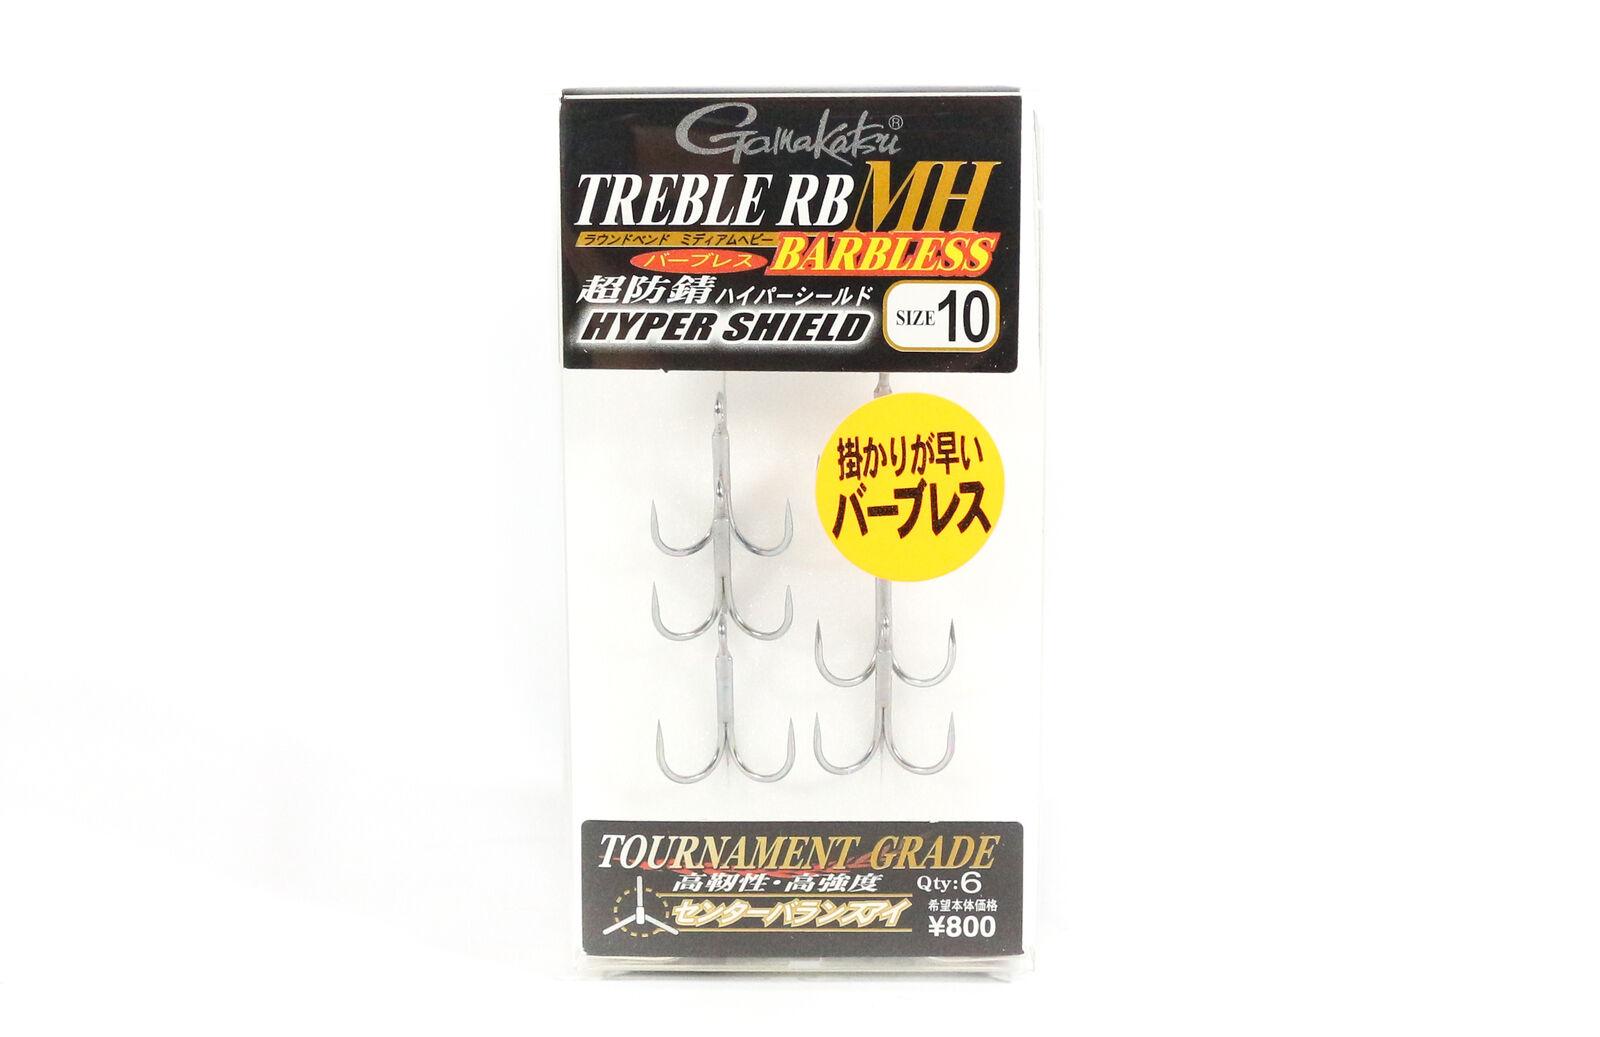 Gamakatsu Treble Hook RB MH BL Barbless Hyper Shield Size 5 9168